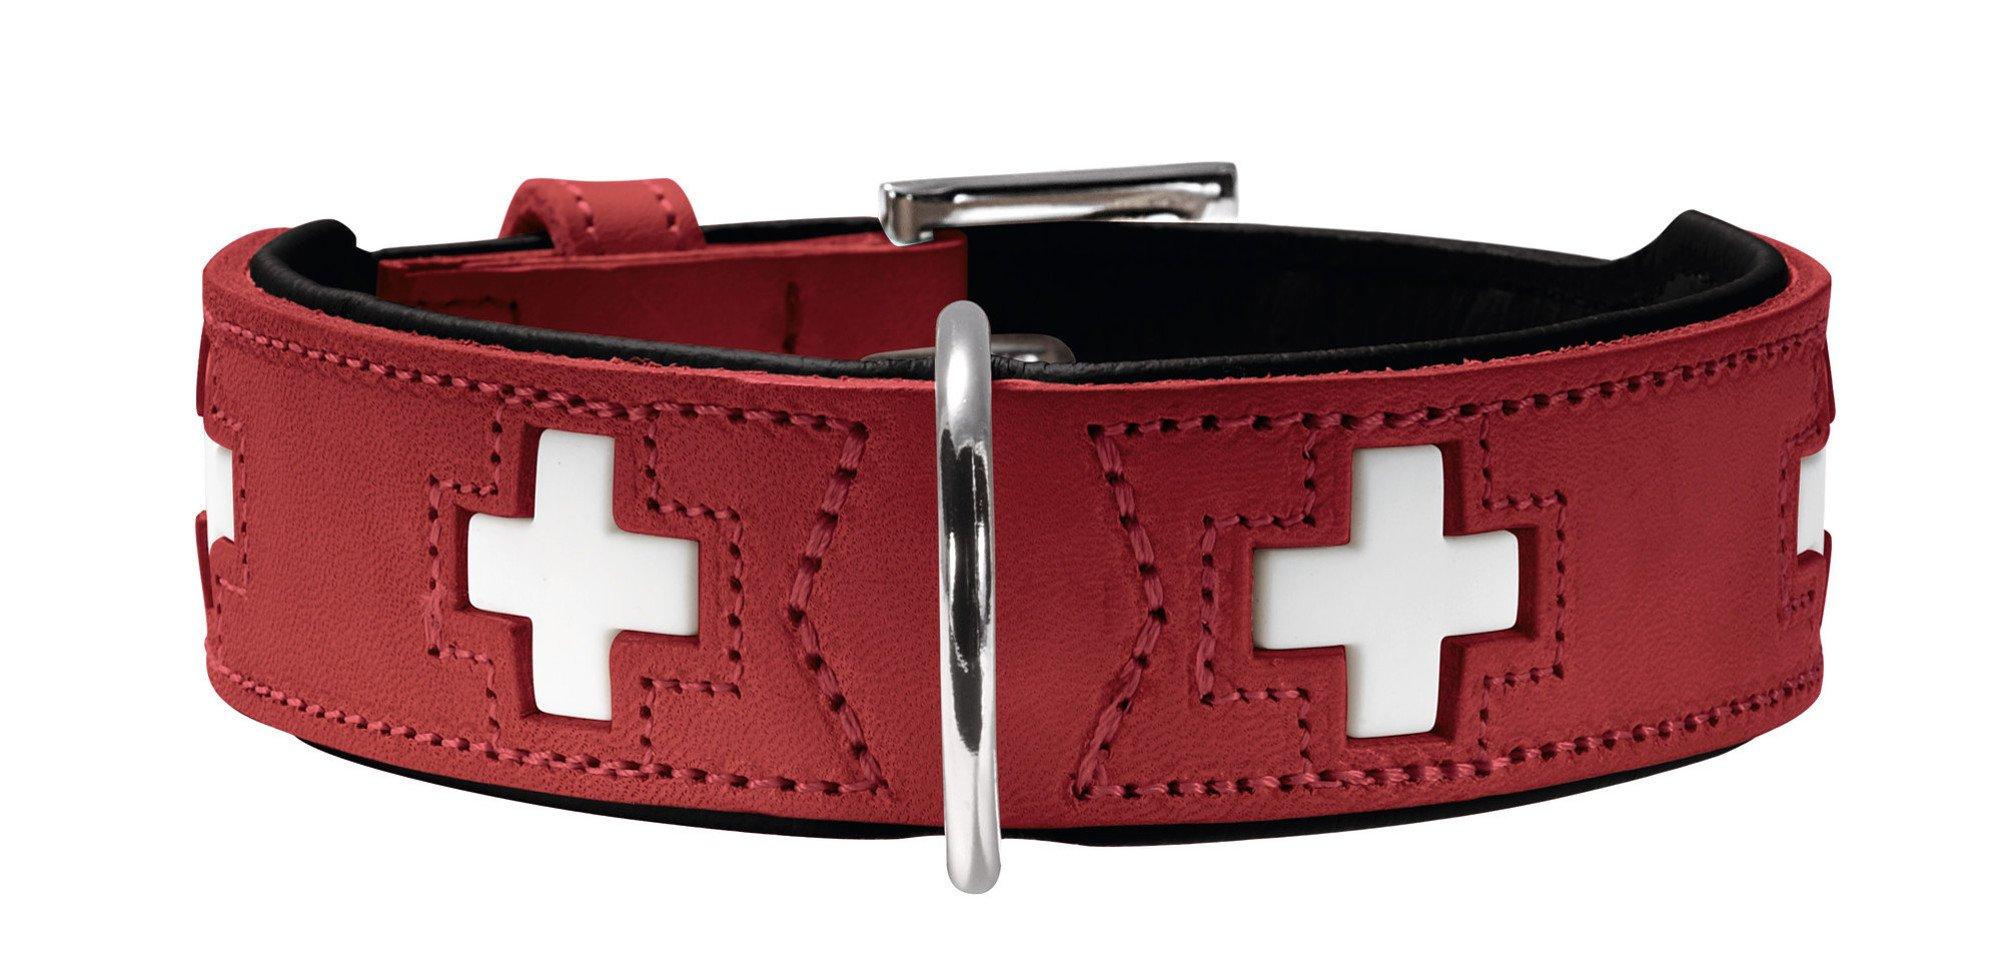 hunter Collar Swiss 70 Organic Leather, 56.0-63.5 cm, Red/Black by hunter